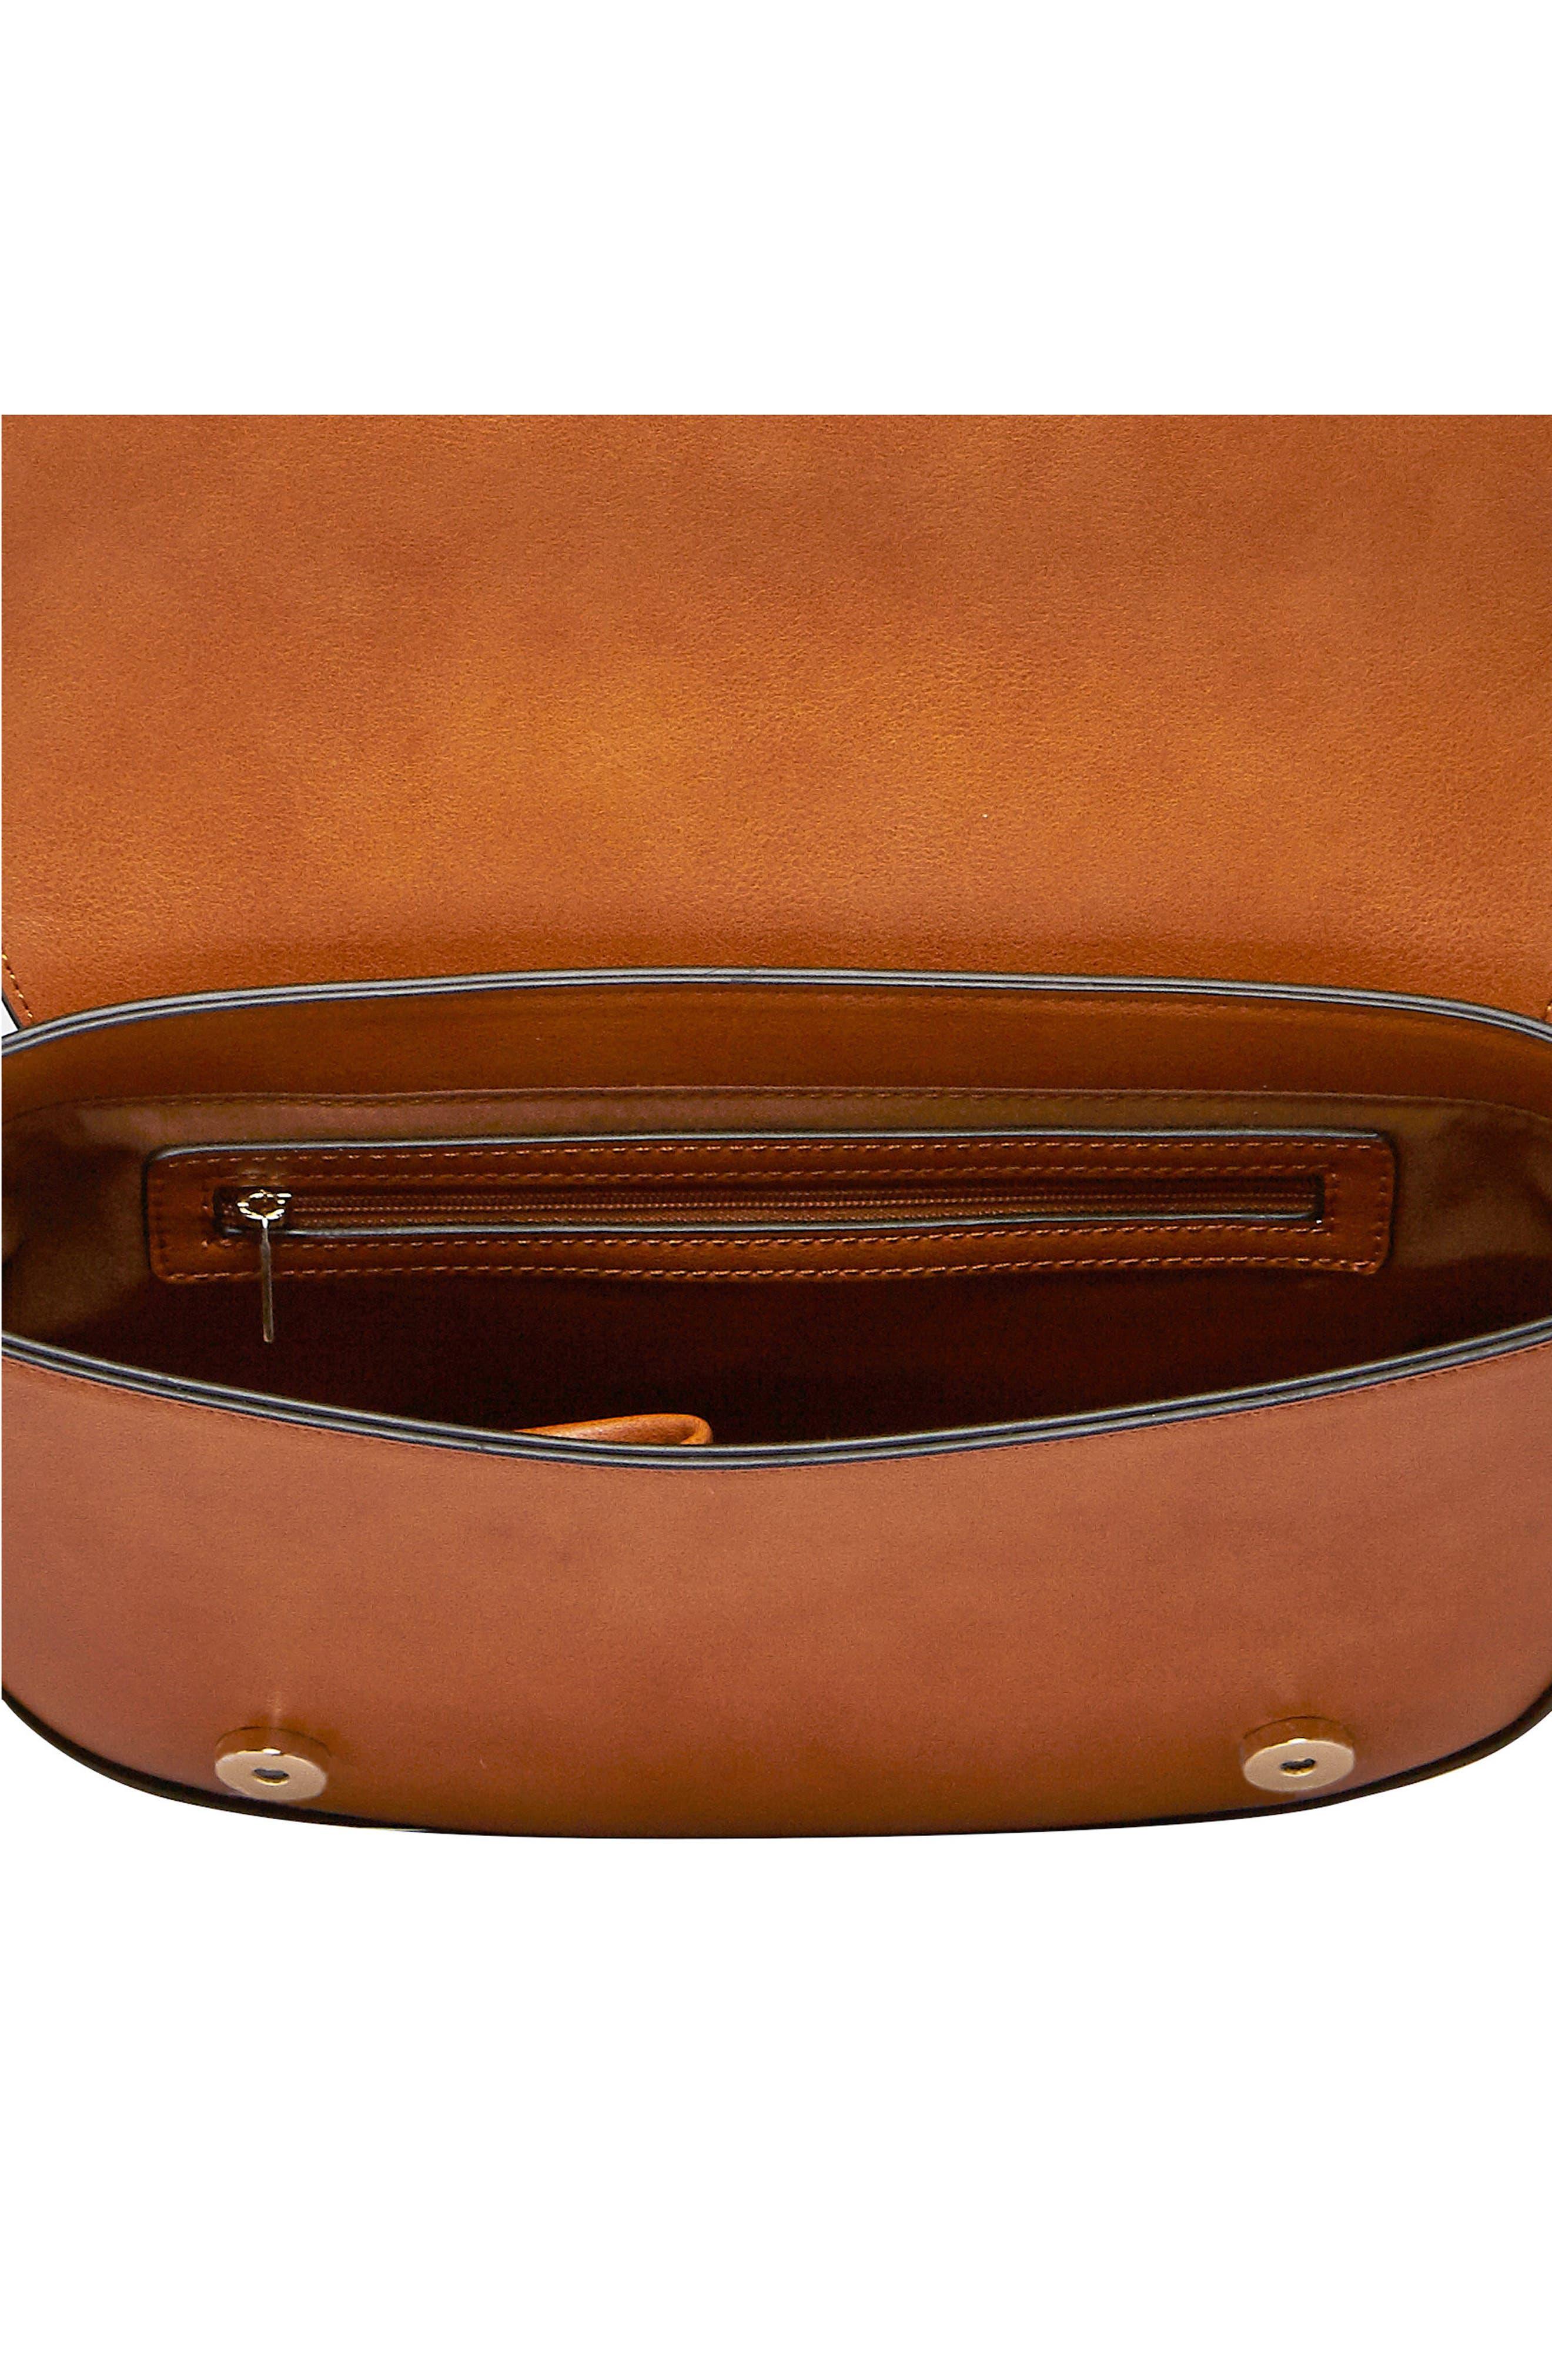 Lola Vegan Leather Crossbody Saddle Bag,                             Alternate thumbnail 2, color,                             TAN